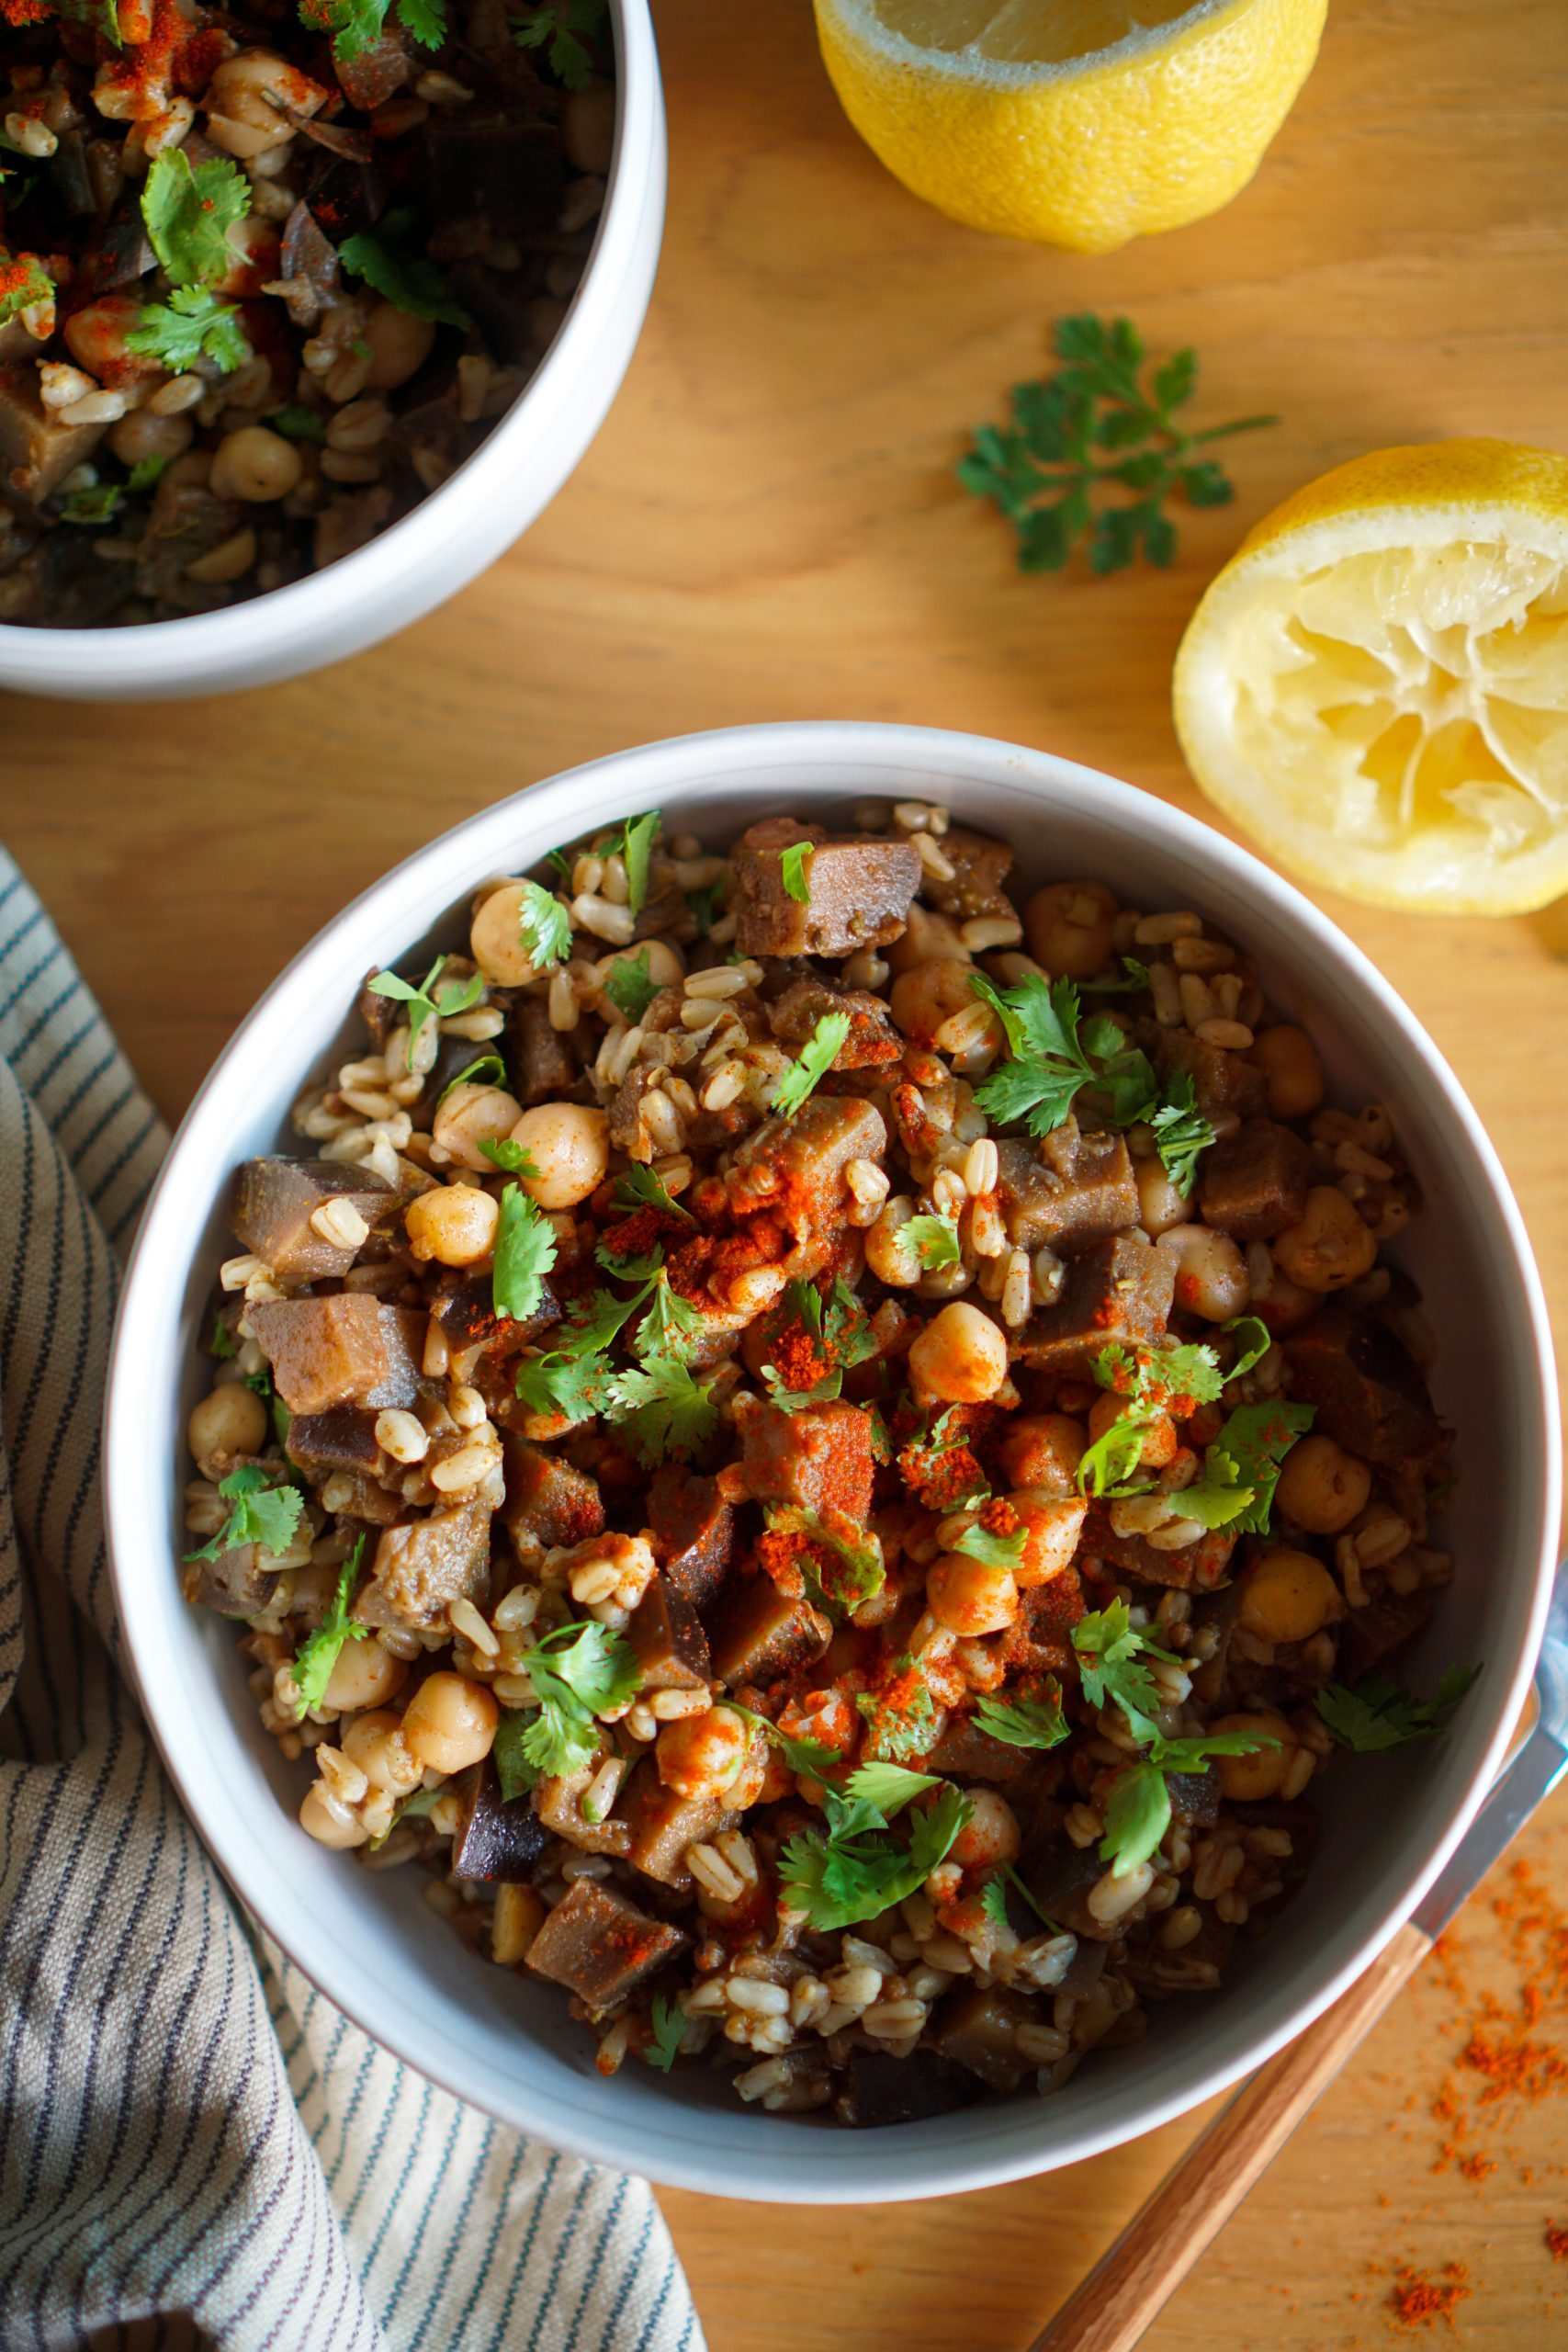 Salade aux pois chiche et aubergines recette vegan sans gluten